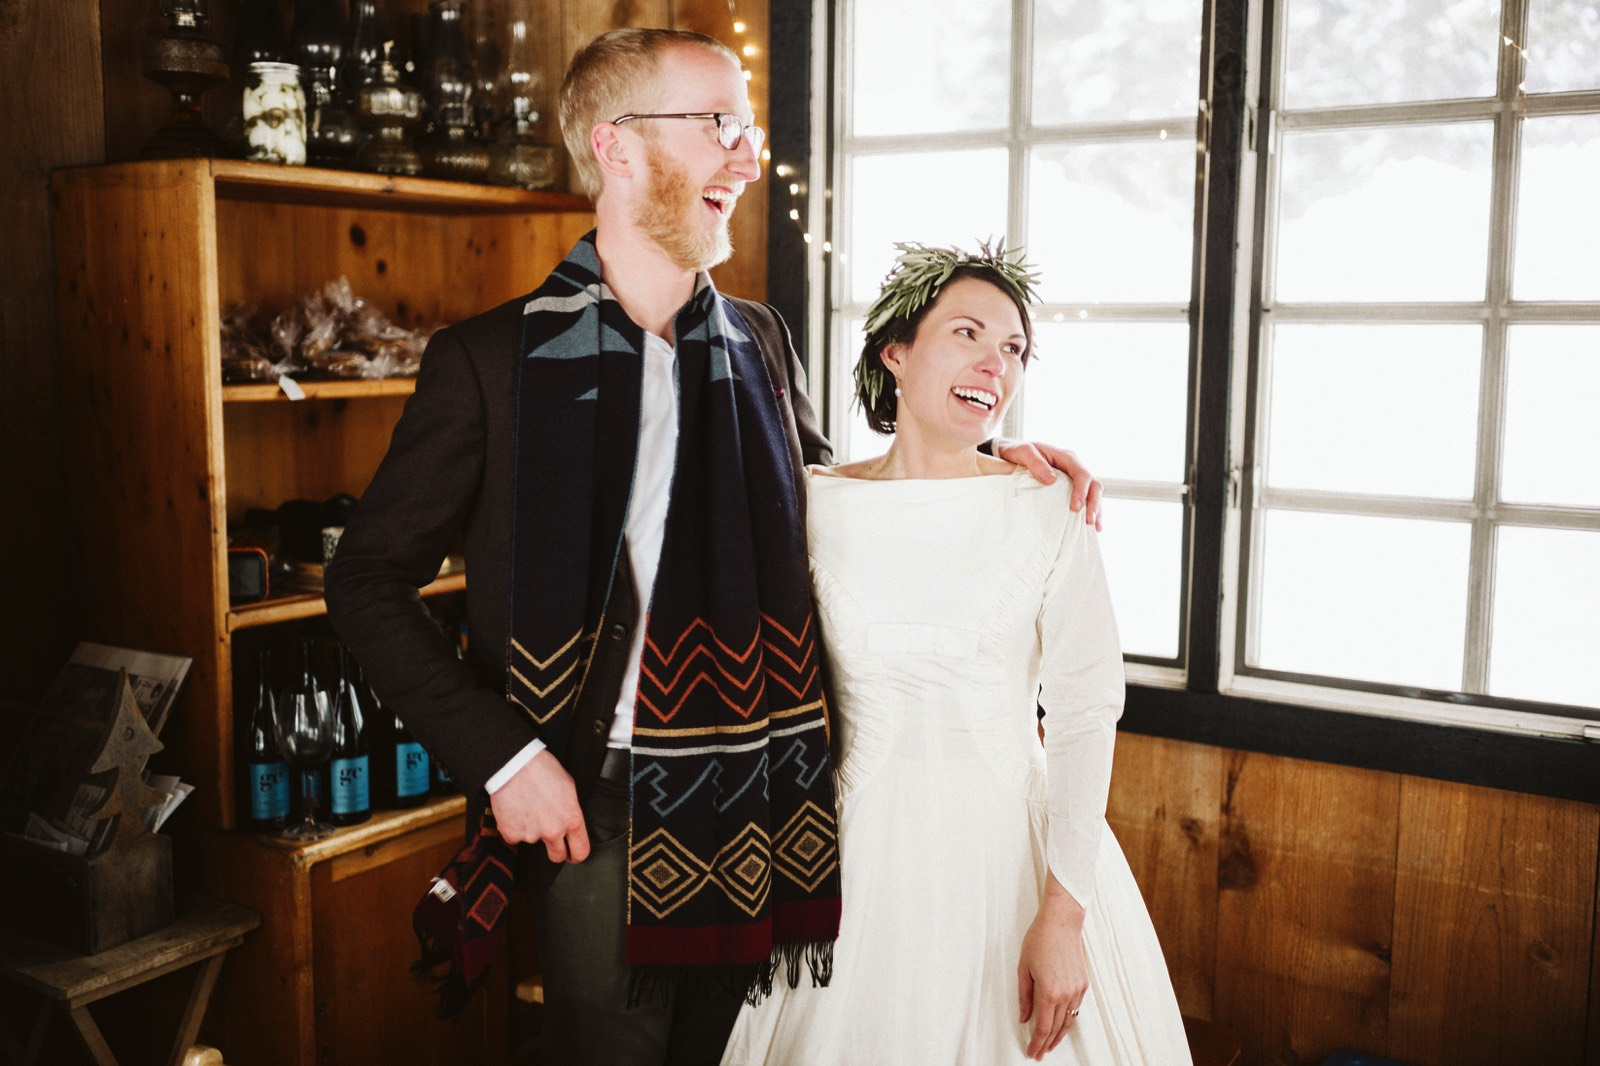 alpine-lakes-high-camp-winter-wedding-81 ALPINE LAKES HIGH CAMP WEDDING